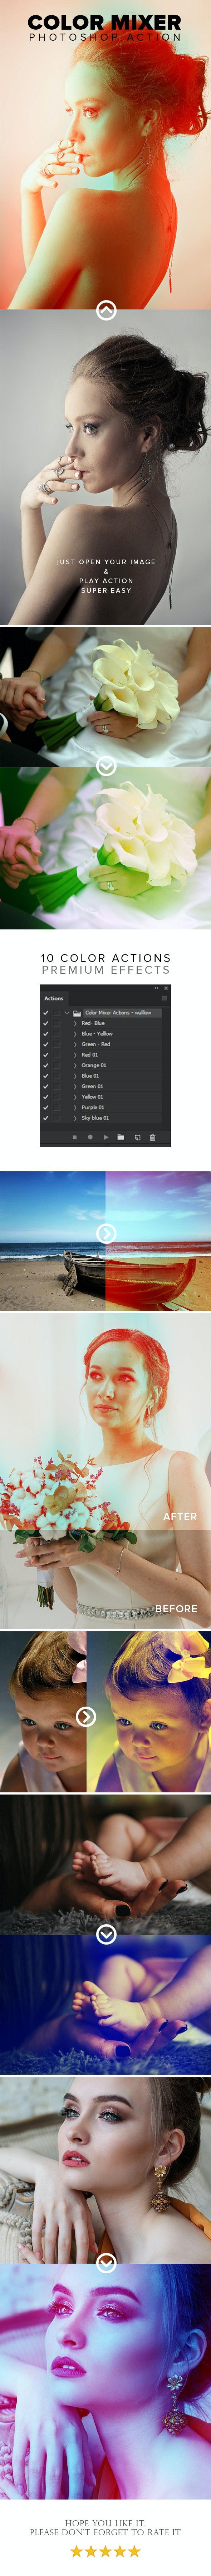 Color Mixer Photoshop Action - Actions Photoshop